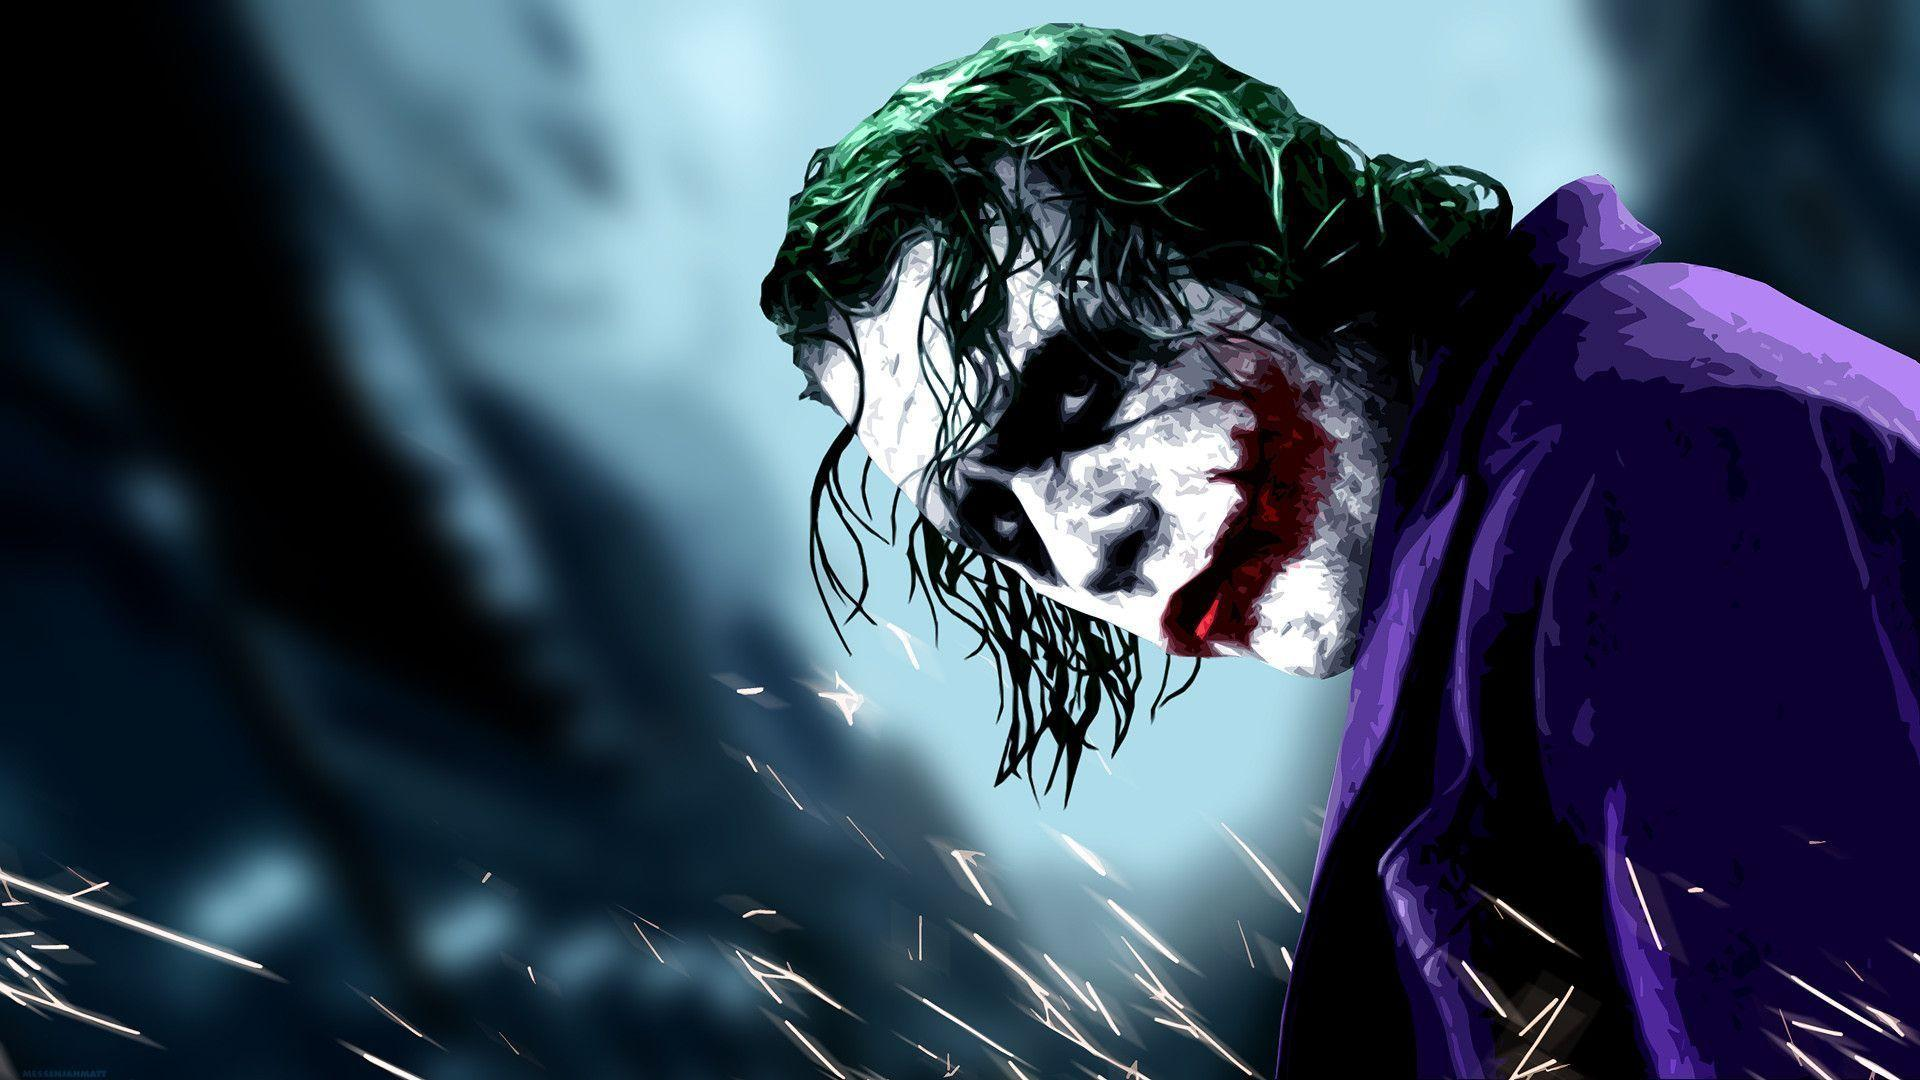 Batman The Dark Knight Joker Wallpapers Hd Wallpaper Cave